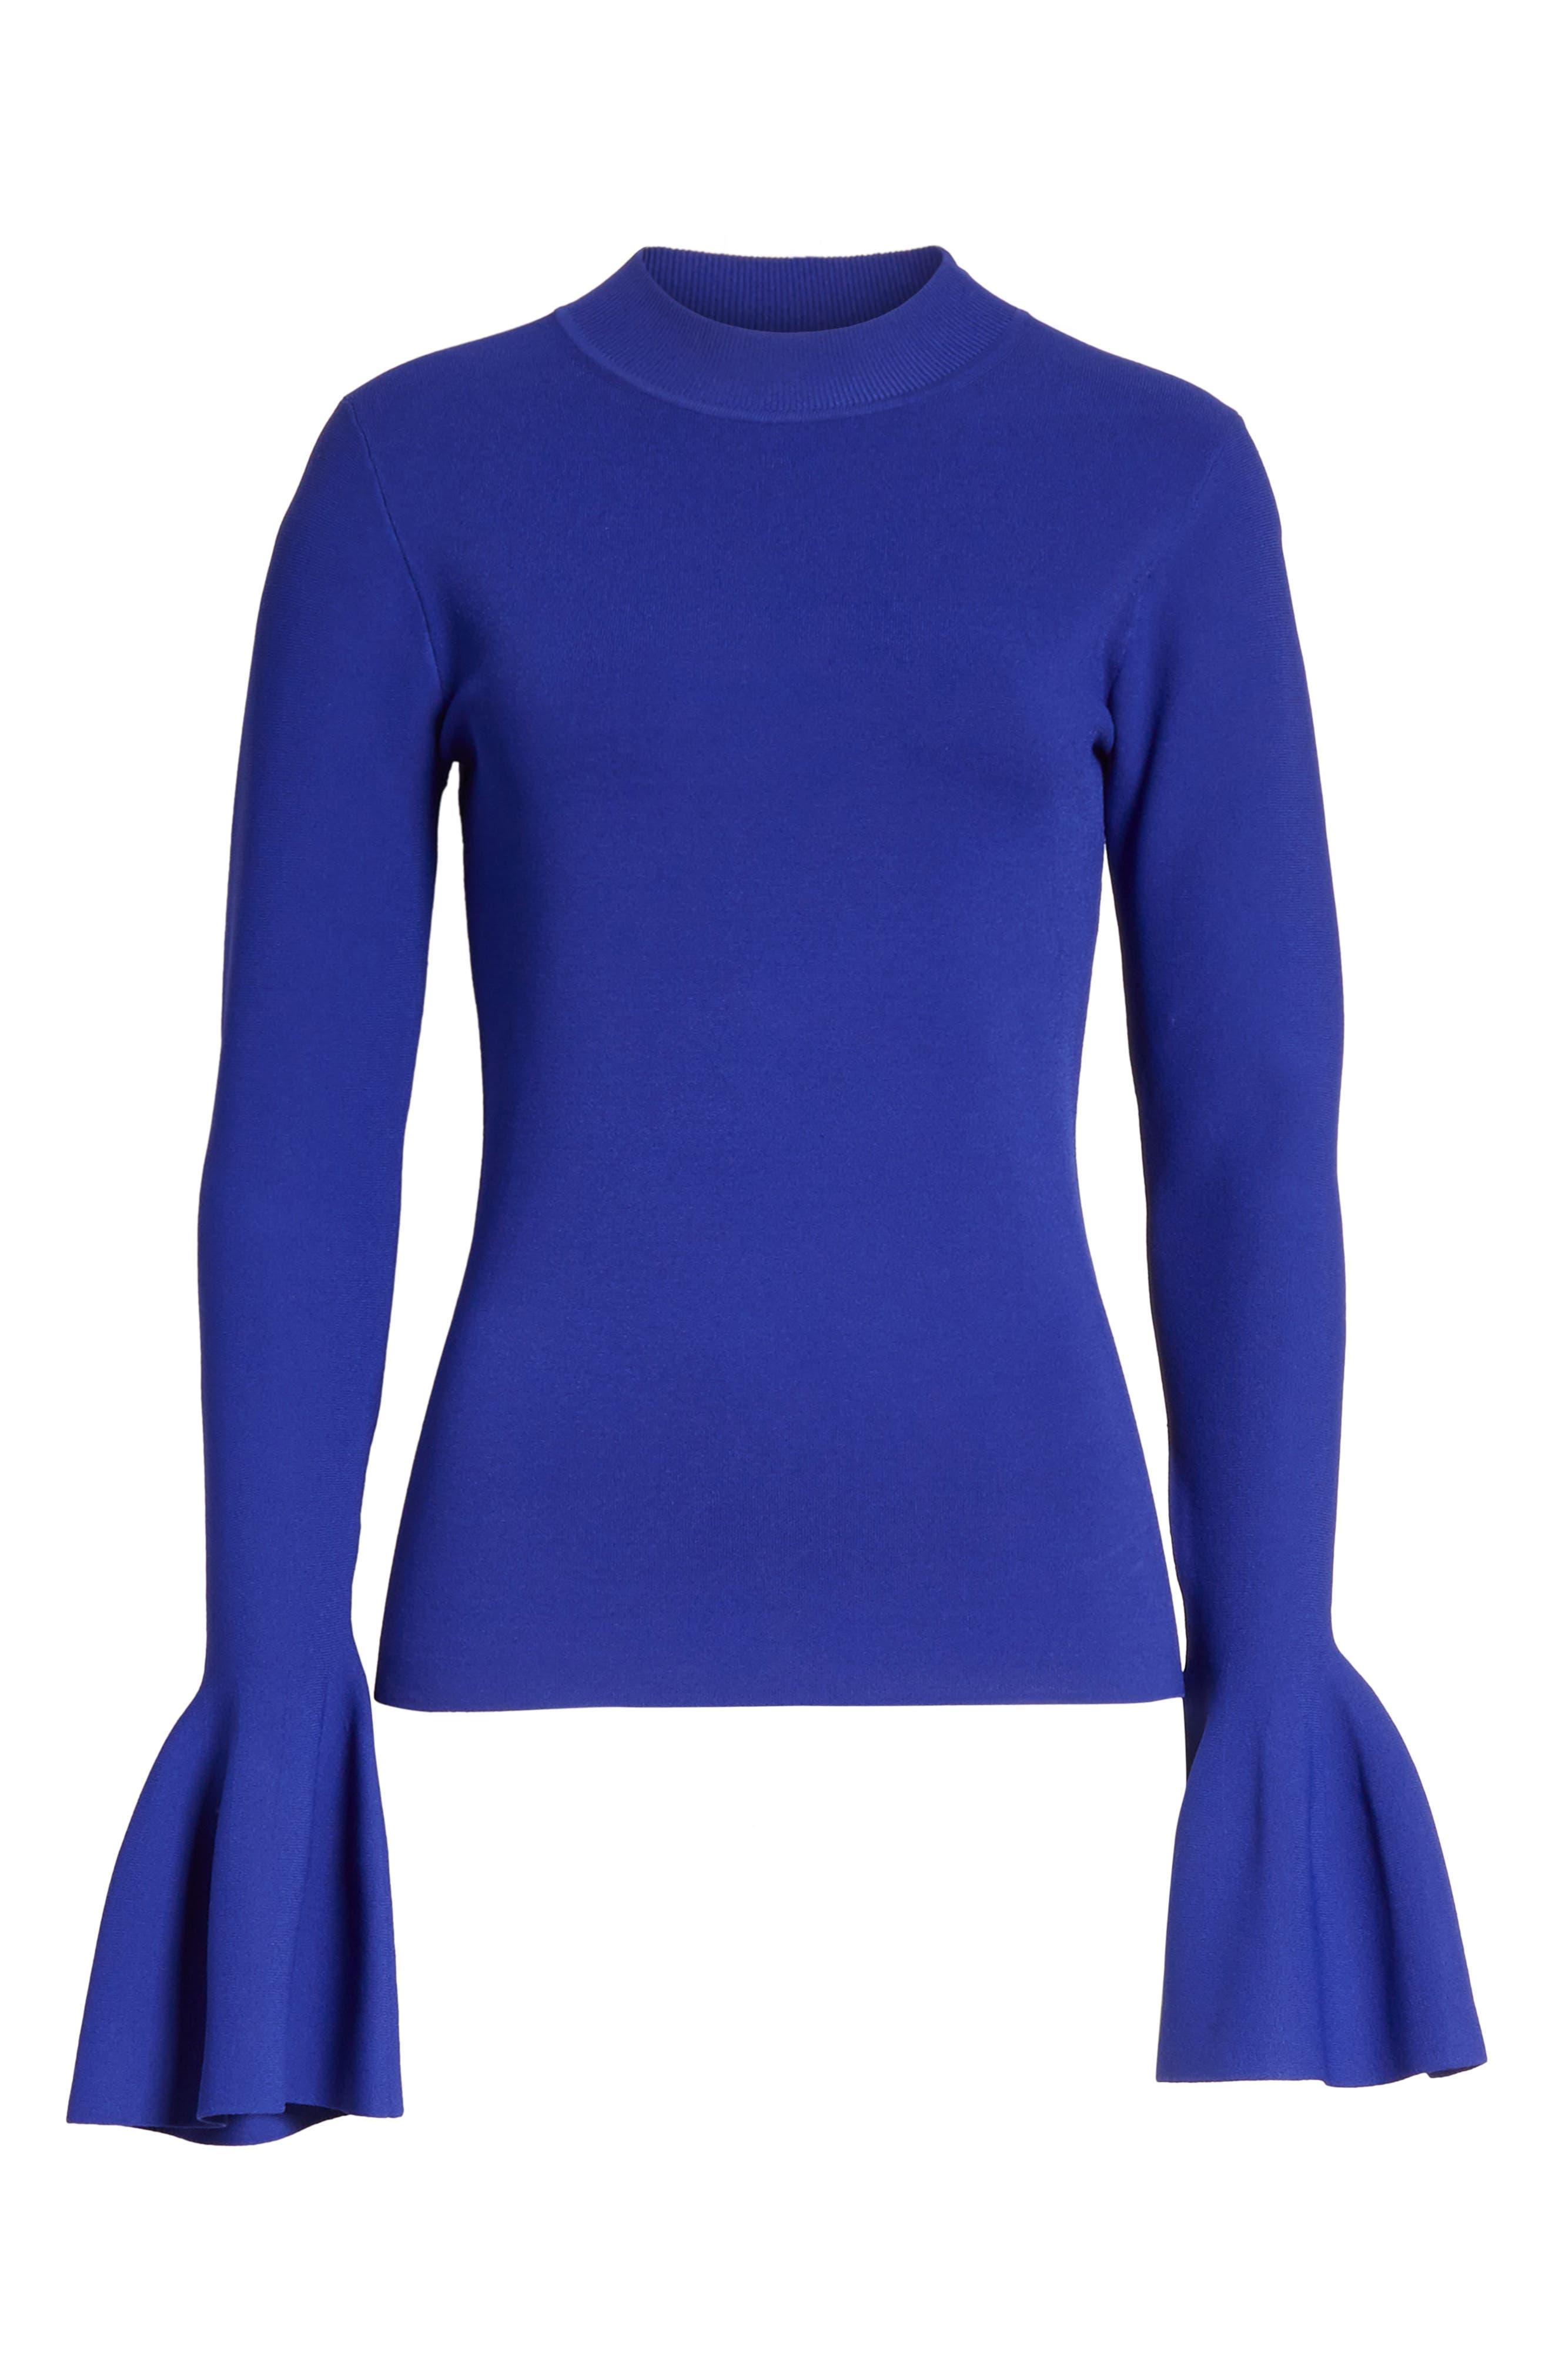 Diane von Furstenberg Flutter Sleeve Mock Neck Sweater,                             Alternate thumbnail 6, color,                             498